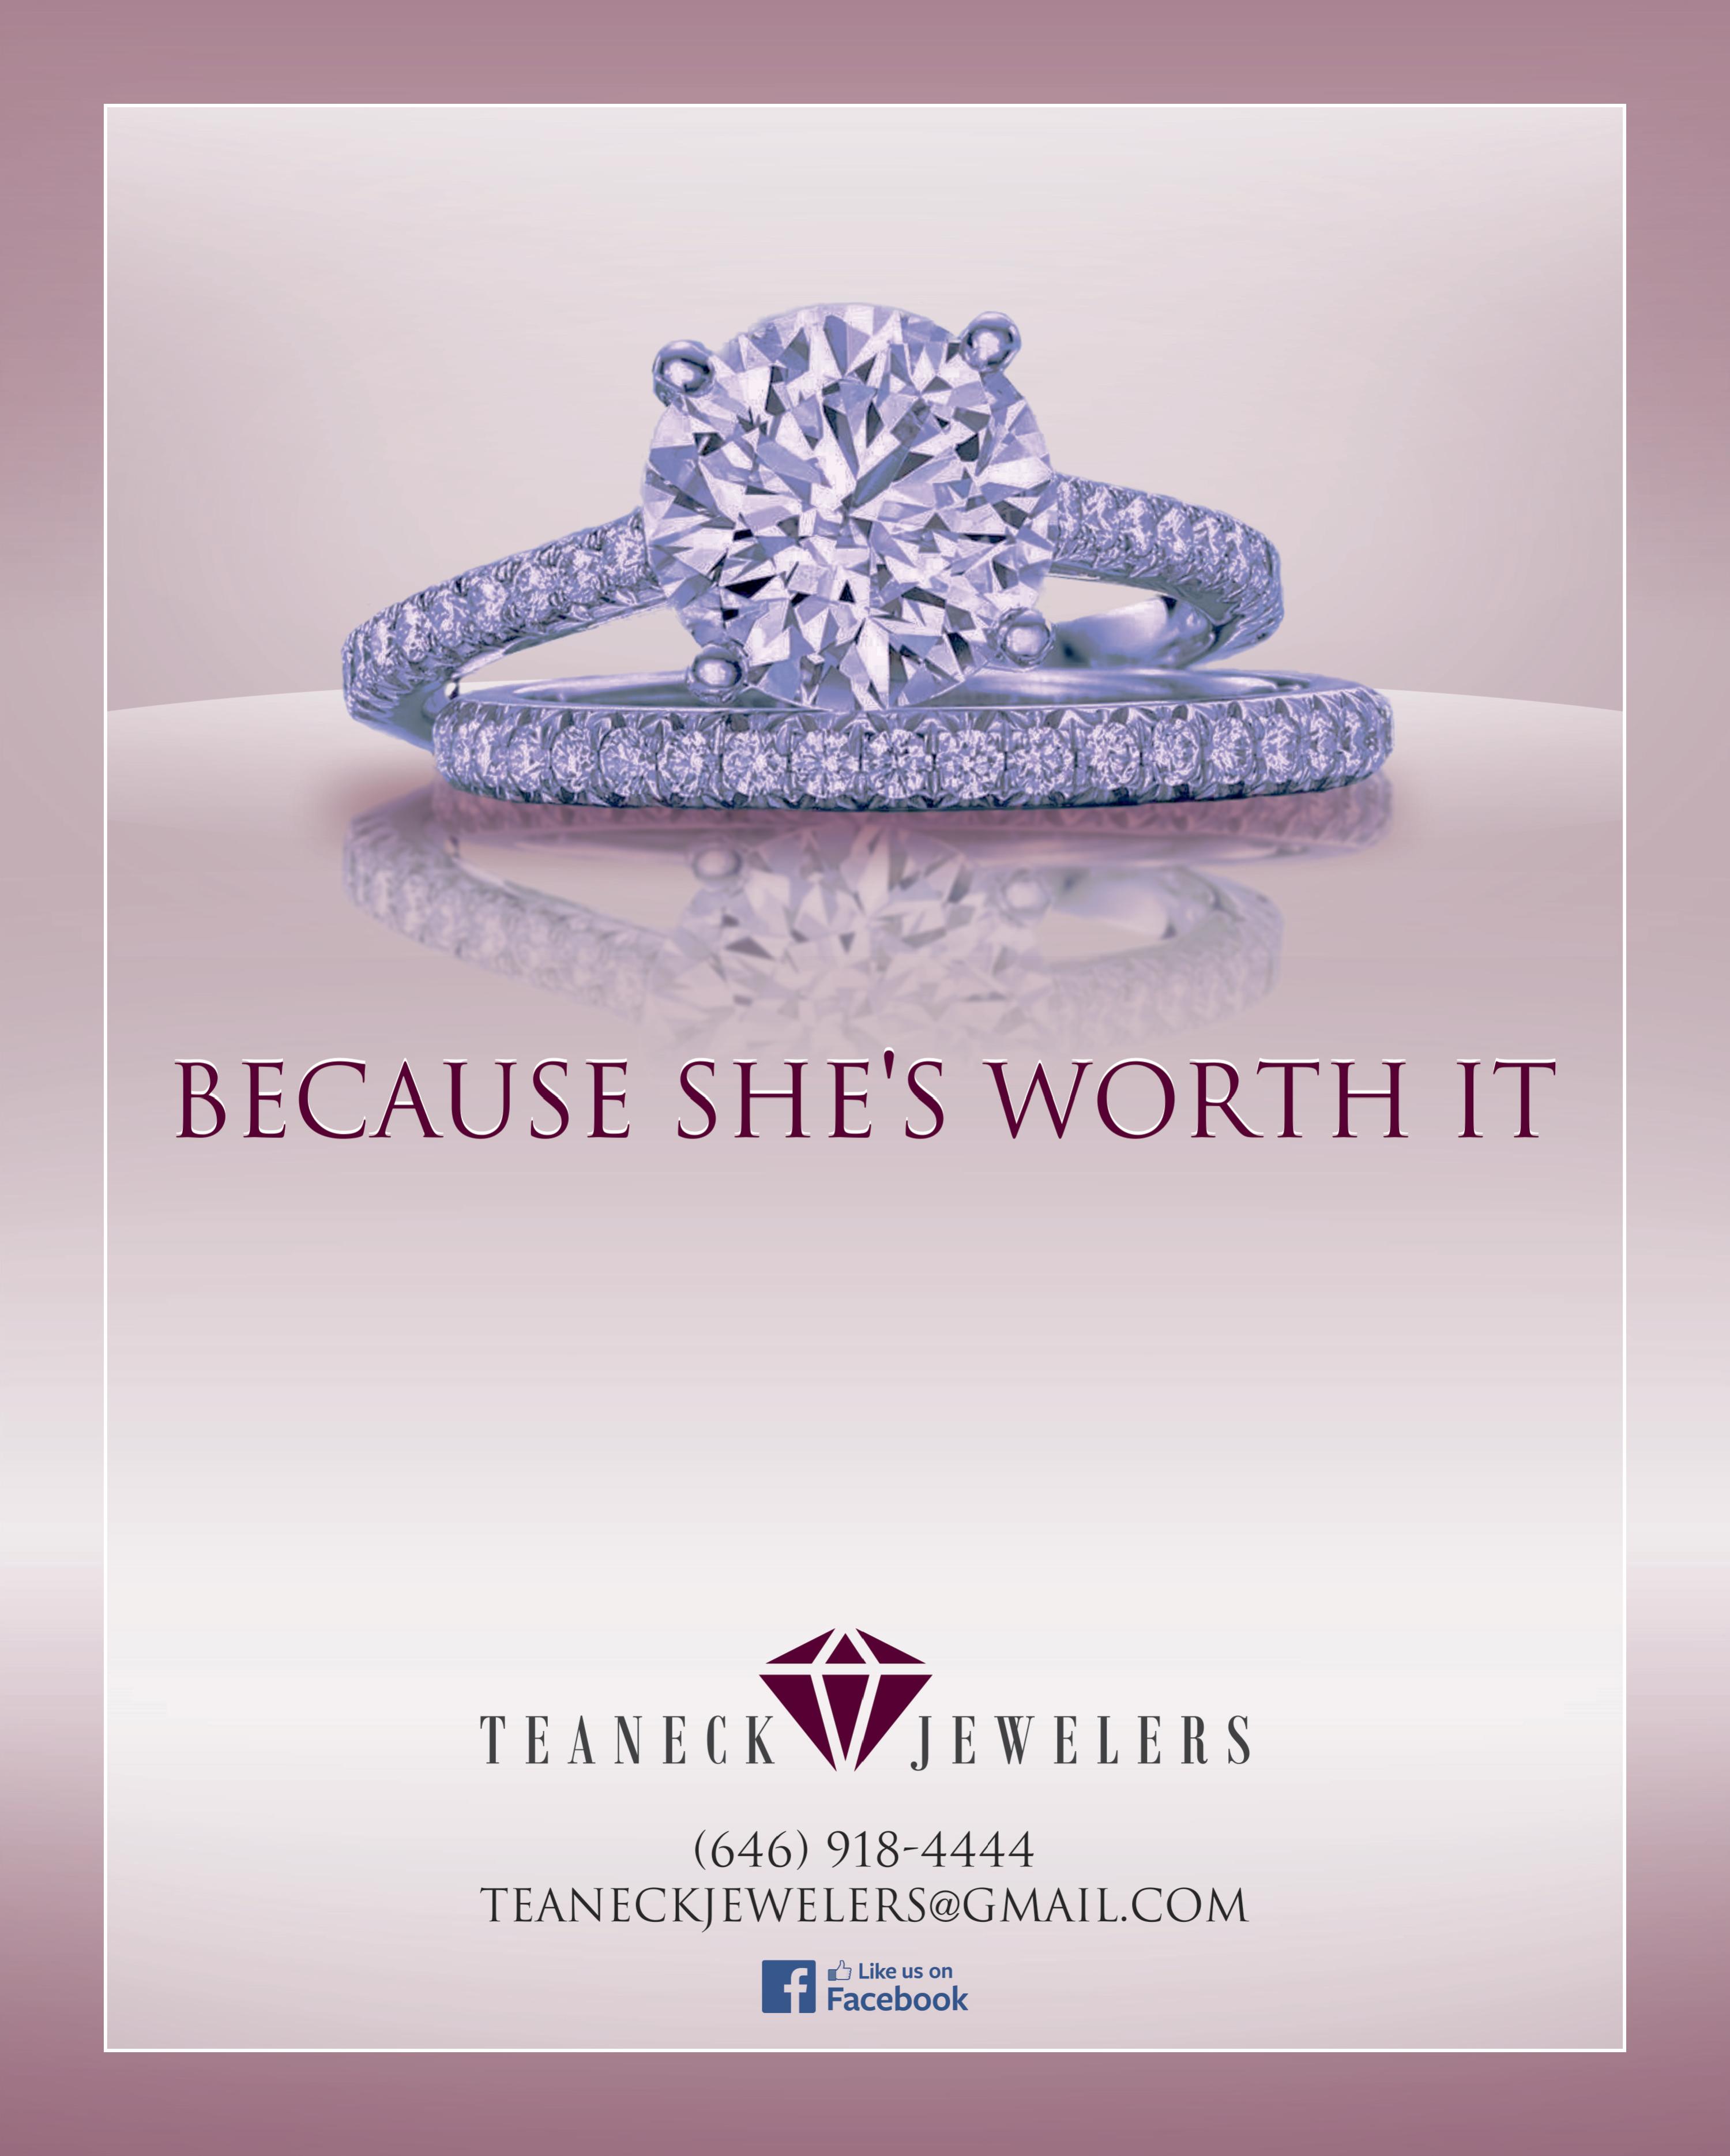 Teaneck Jewelers